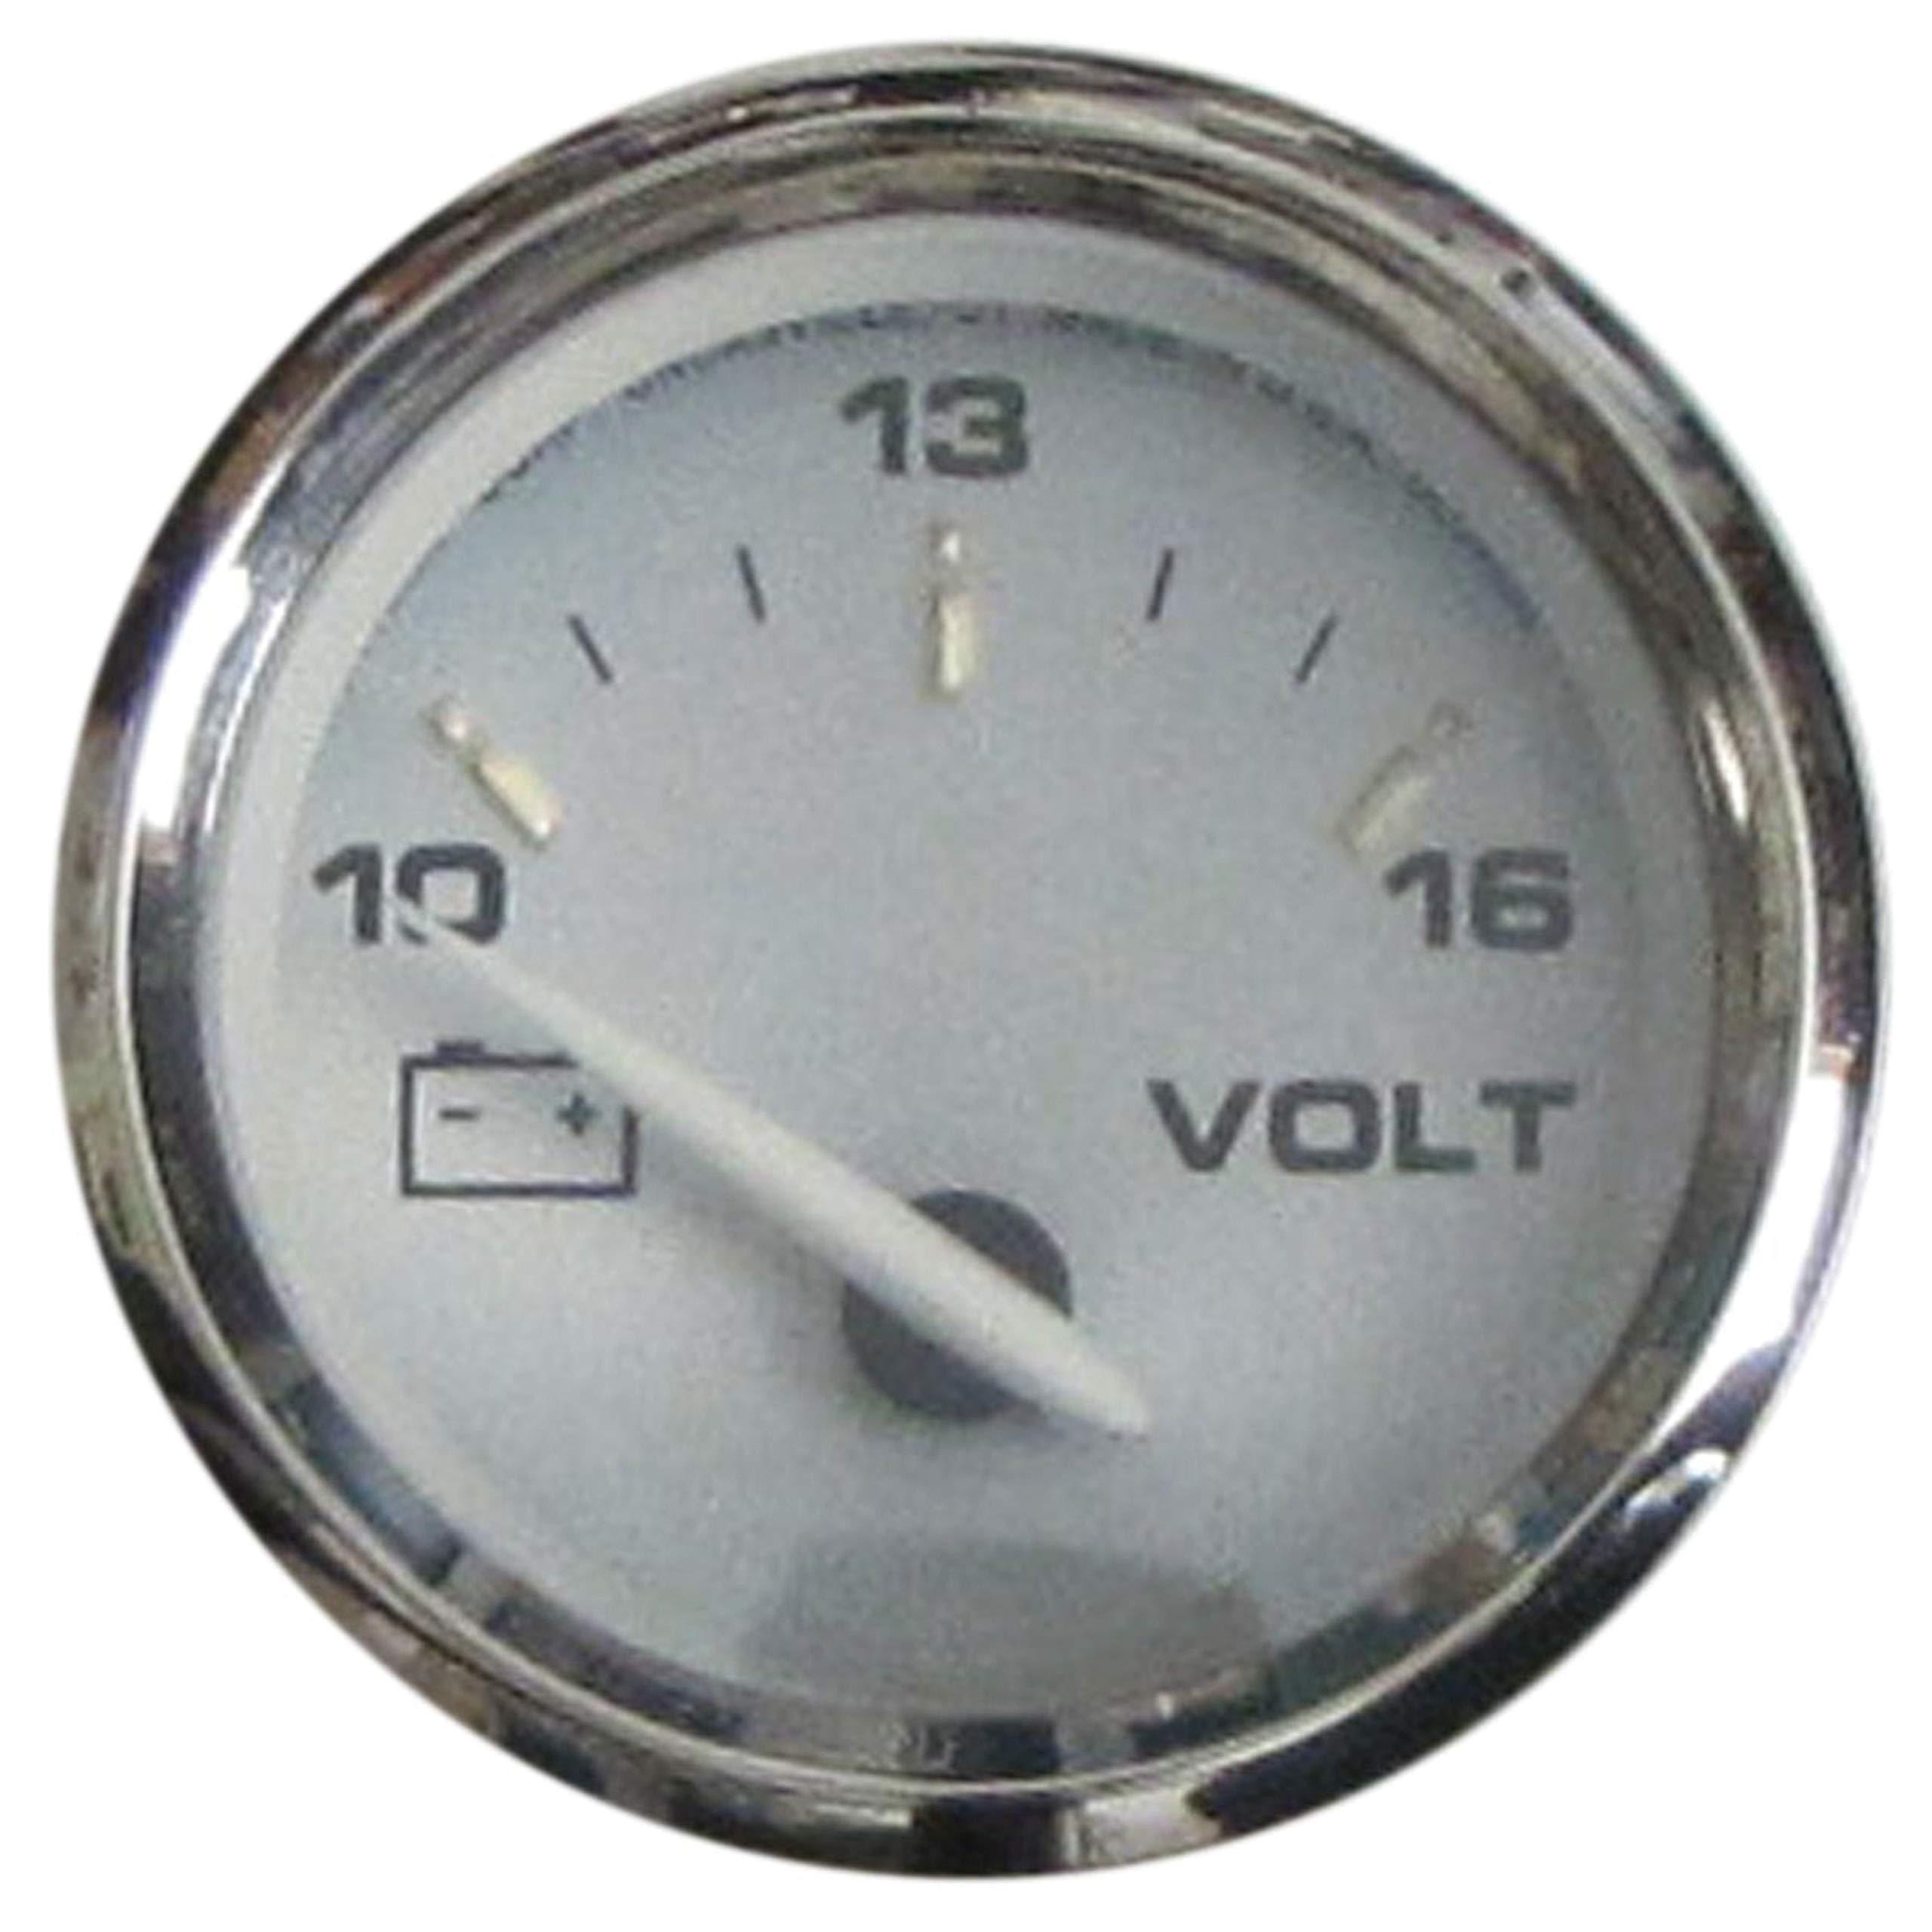 Faria Beige 19004 Kronos Voltmeter 10-16Vdc by Faria